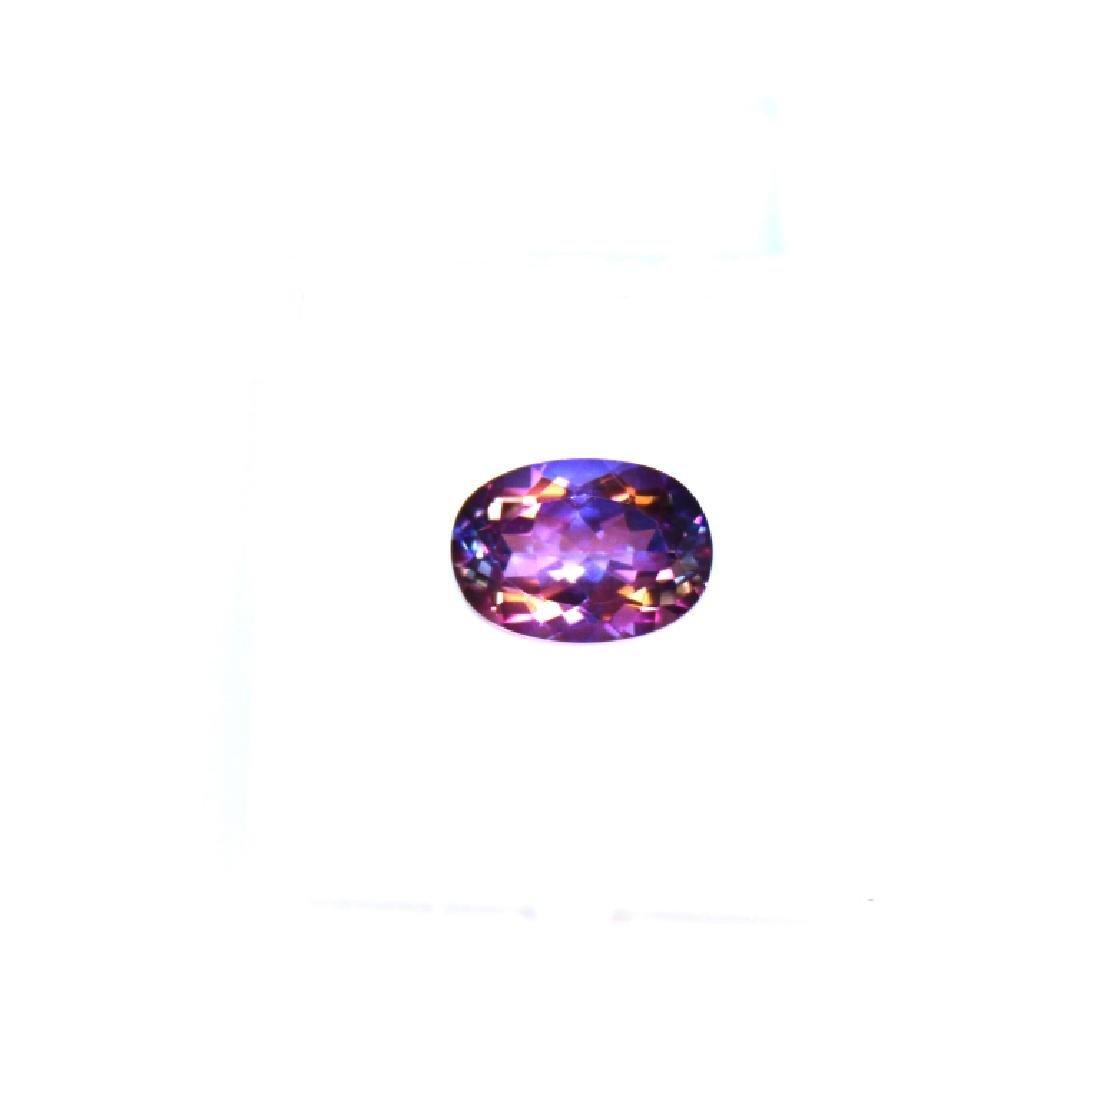 6.50 CT MIN 14x10MM Mystic Topaz Gemstone